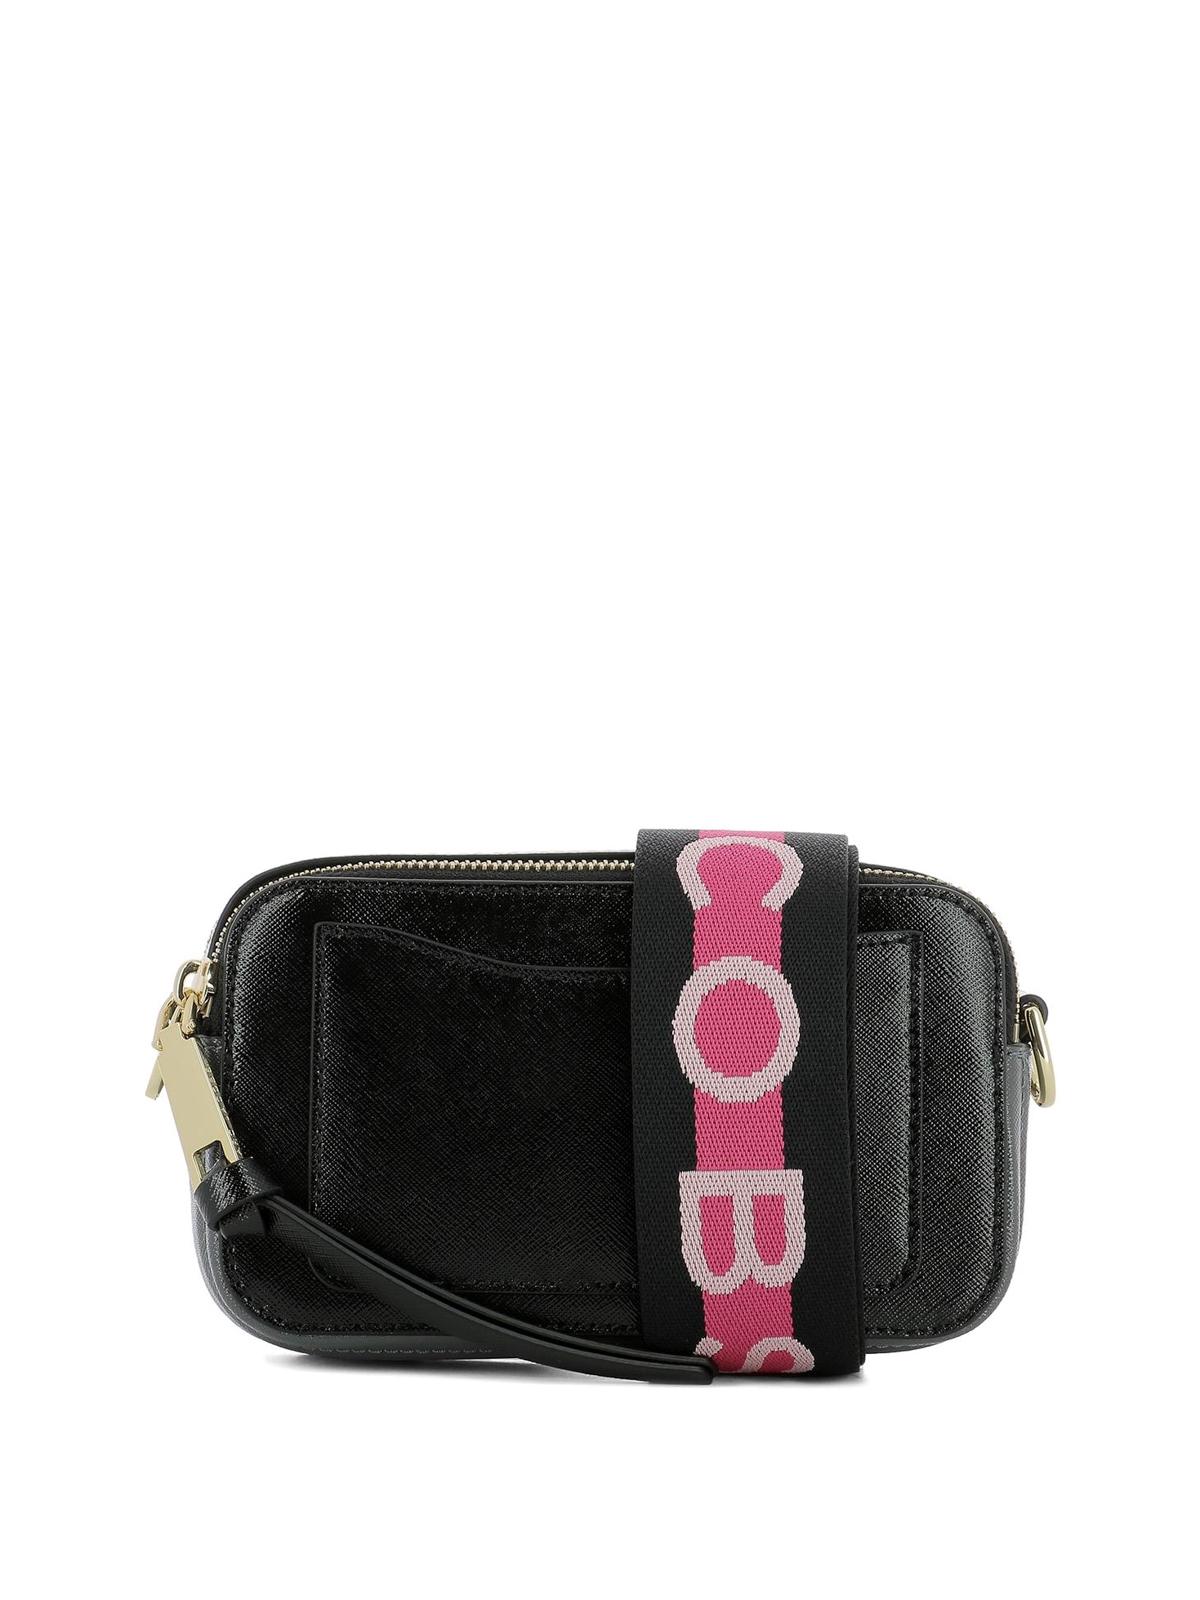 8b2fe2c52d iKRIX MARC JACOBS: cross body bags - Snapshot small black leather bag